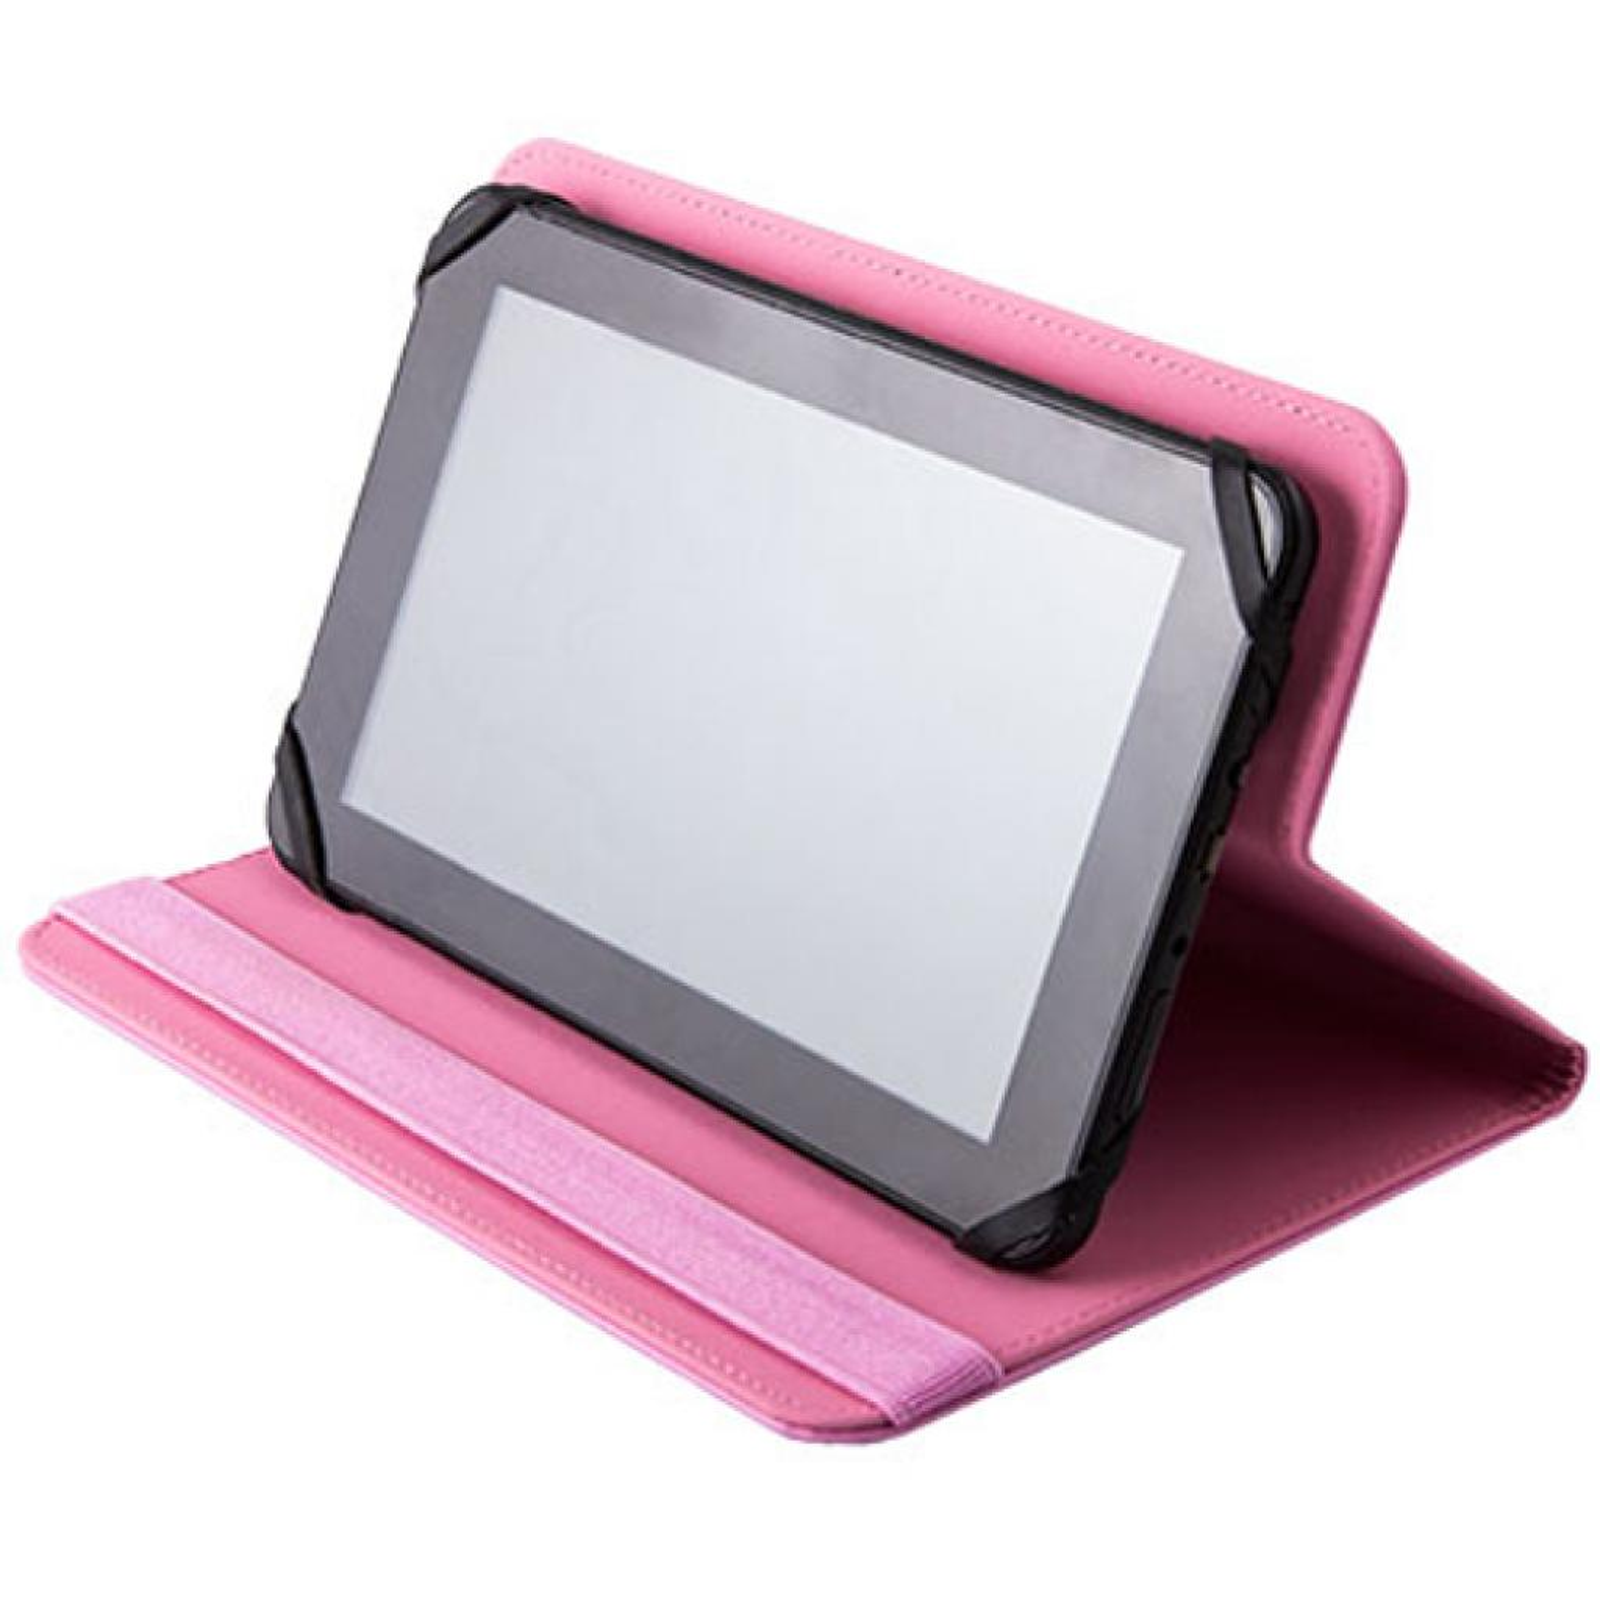 "Чехол для планшета Vellini 7"" Universal stand Pink (216876) изображение 3"